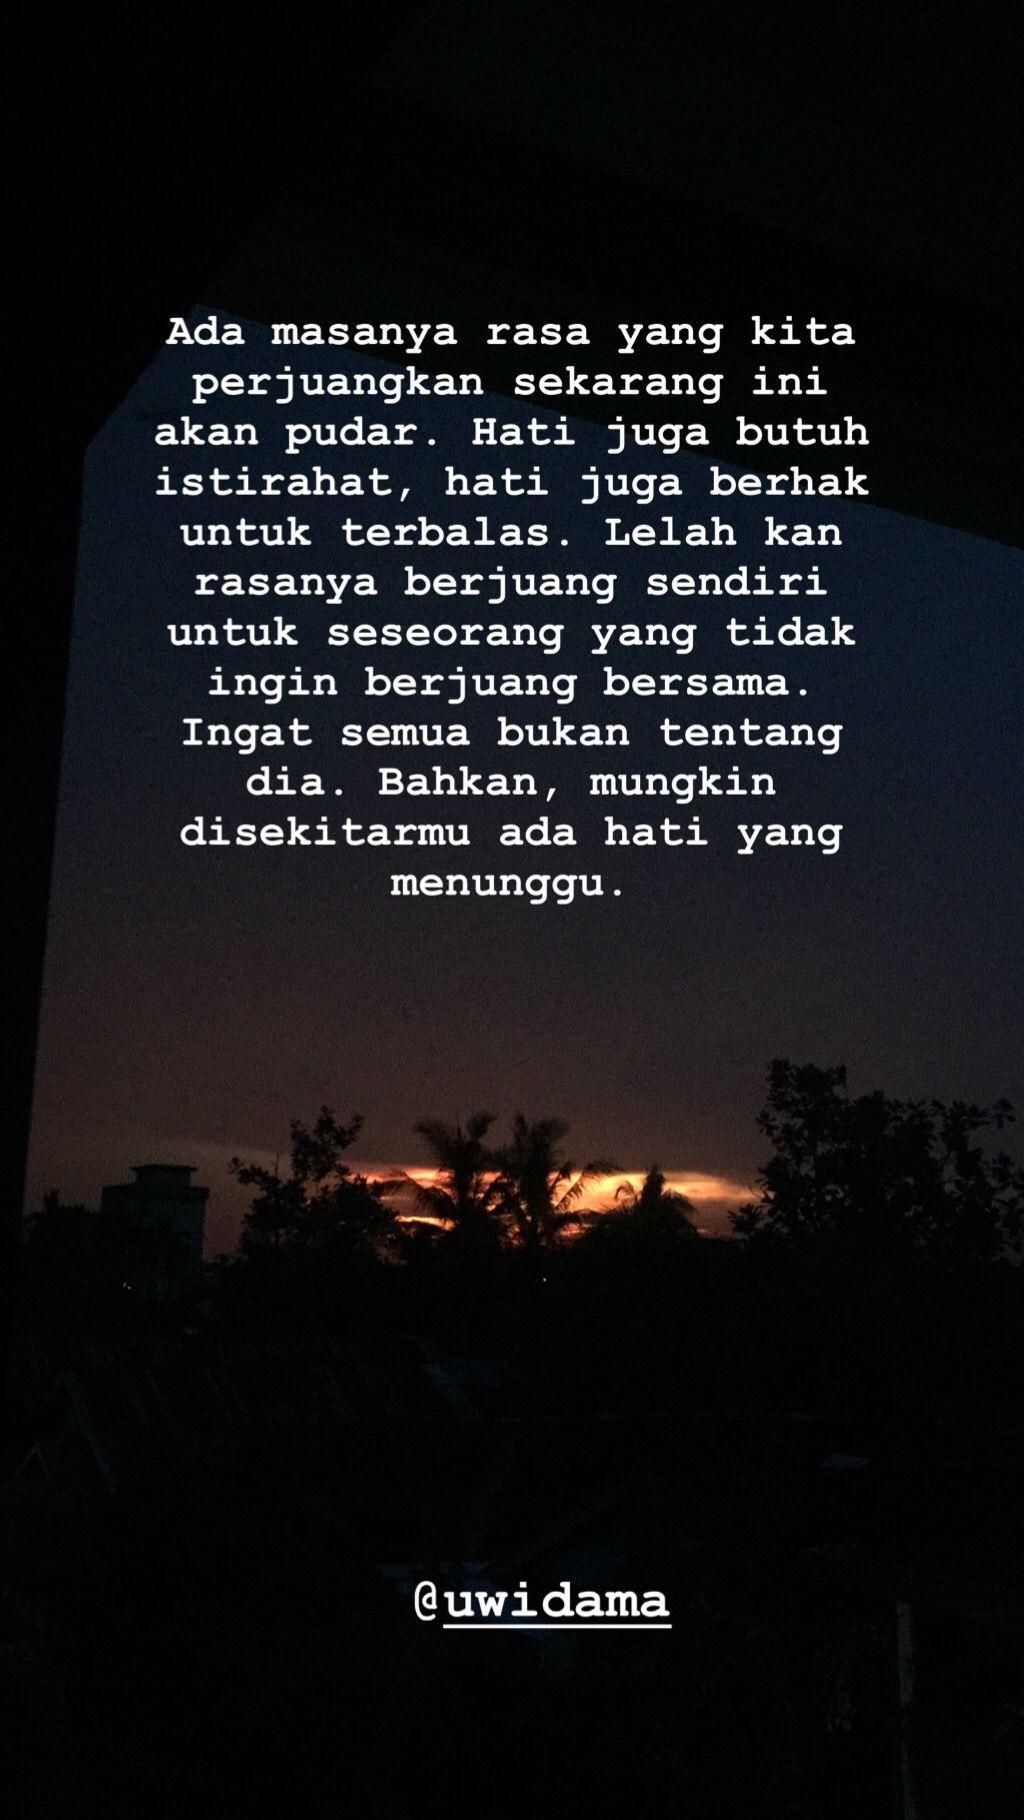 Quotes Remaja Inspirasi Instagram Kutipan Instagramstory